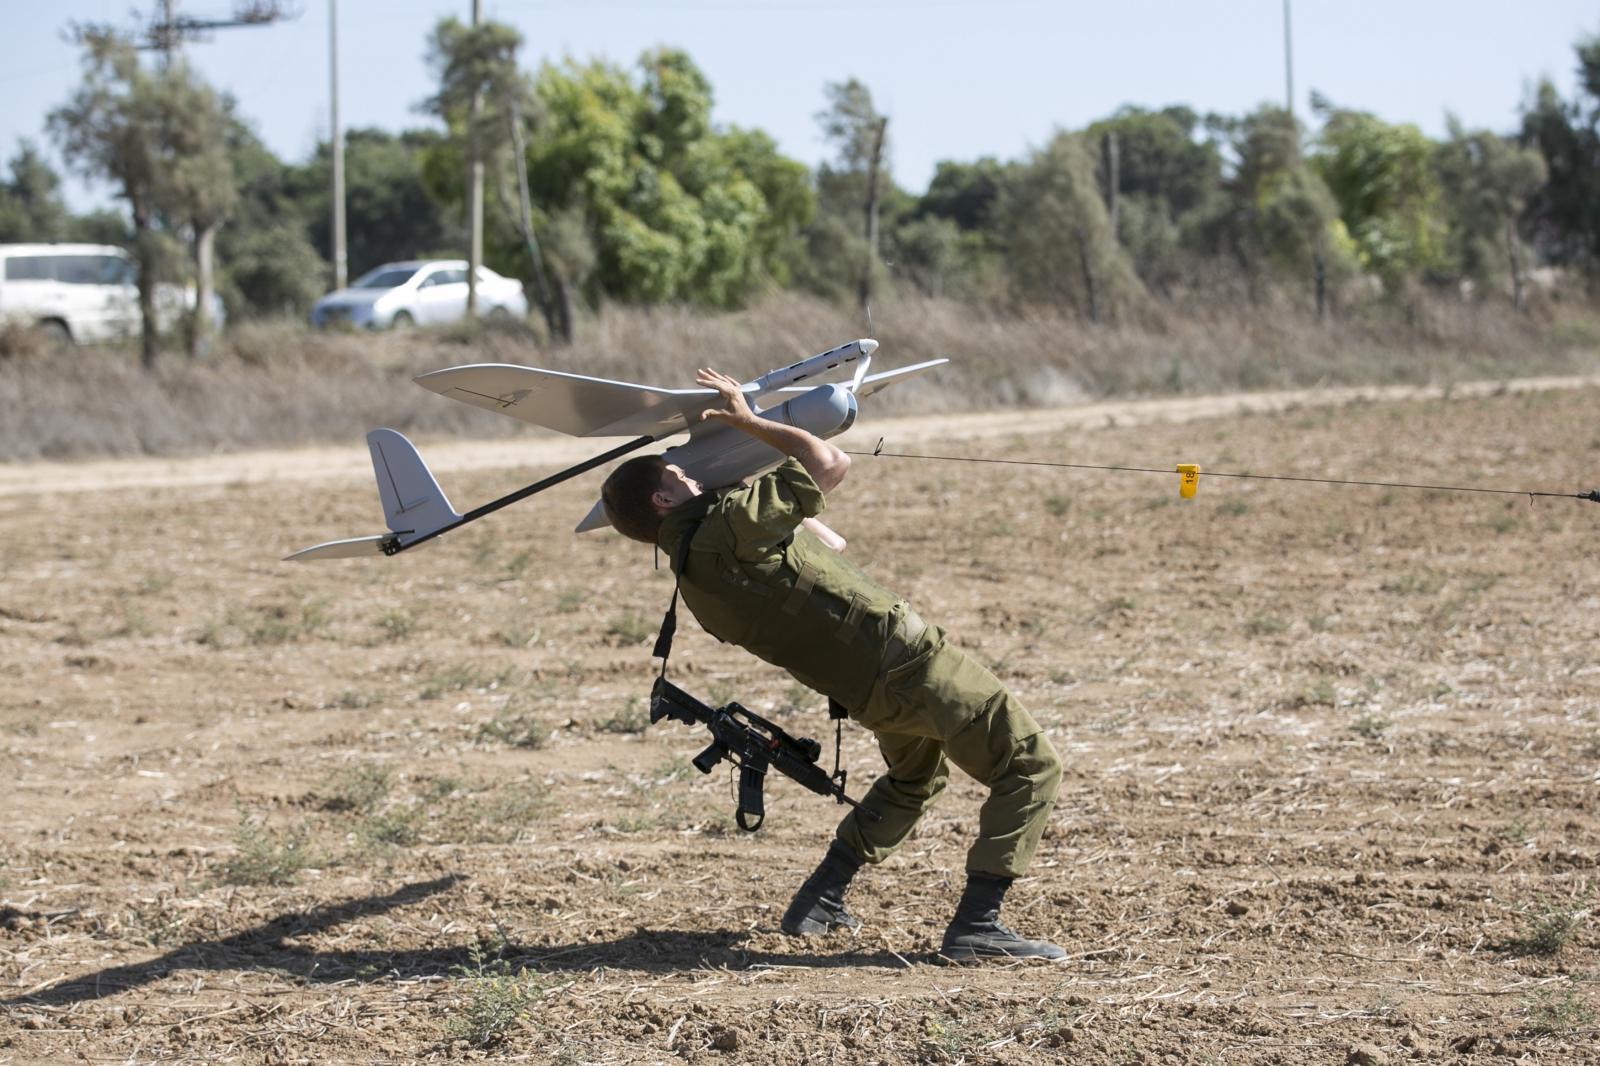 Islamic State drone capabilities